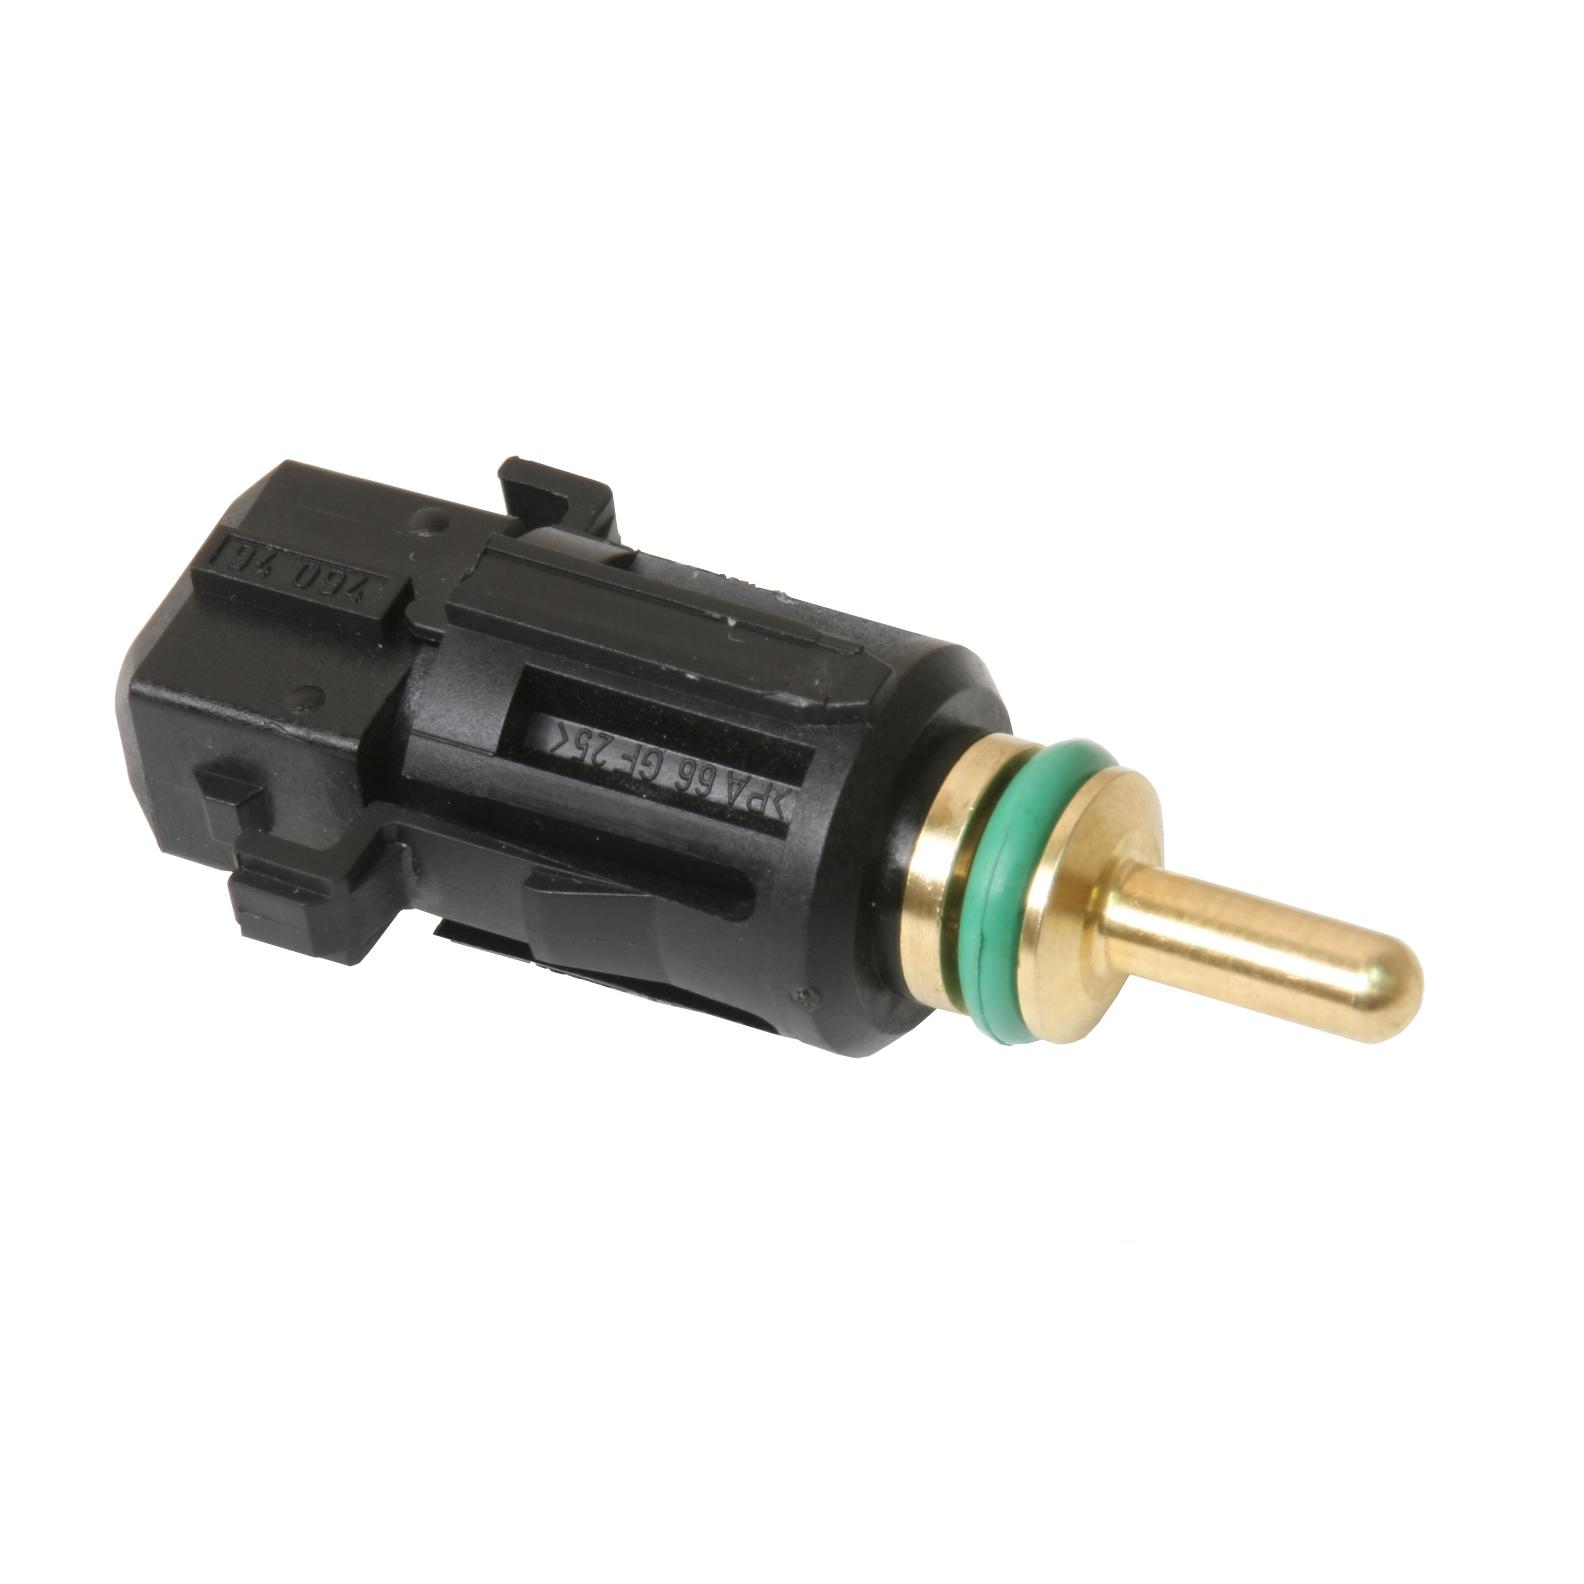 Engine Coolant Temperature Sensor Switch 136217-03993 fits 00-06 BMW X5 4.4L-V8